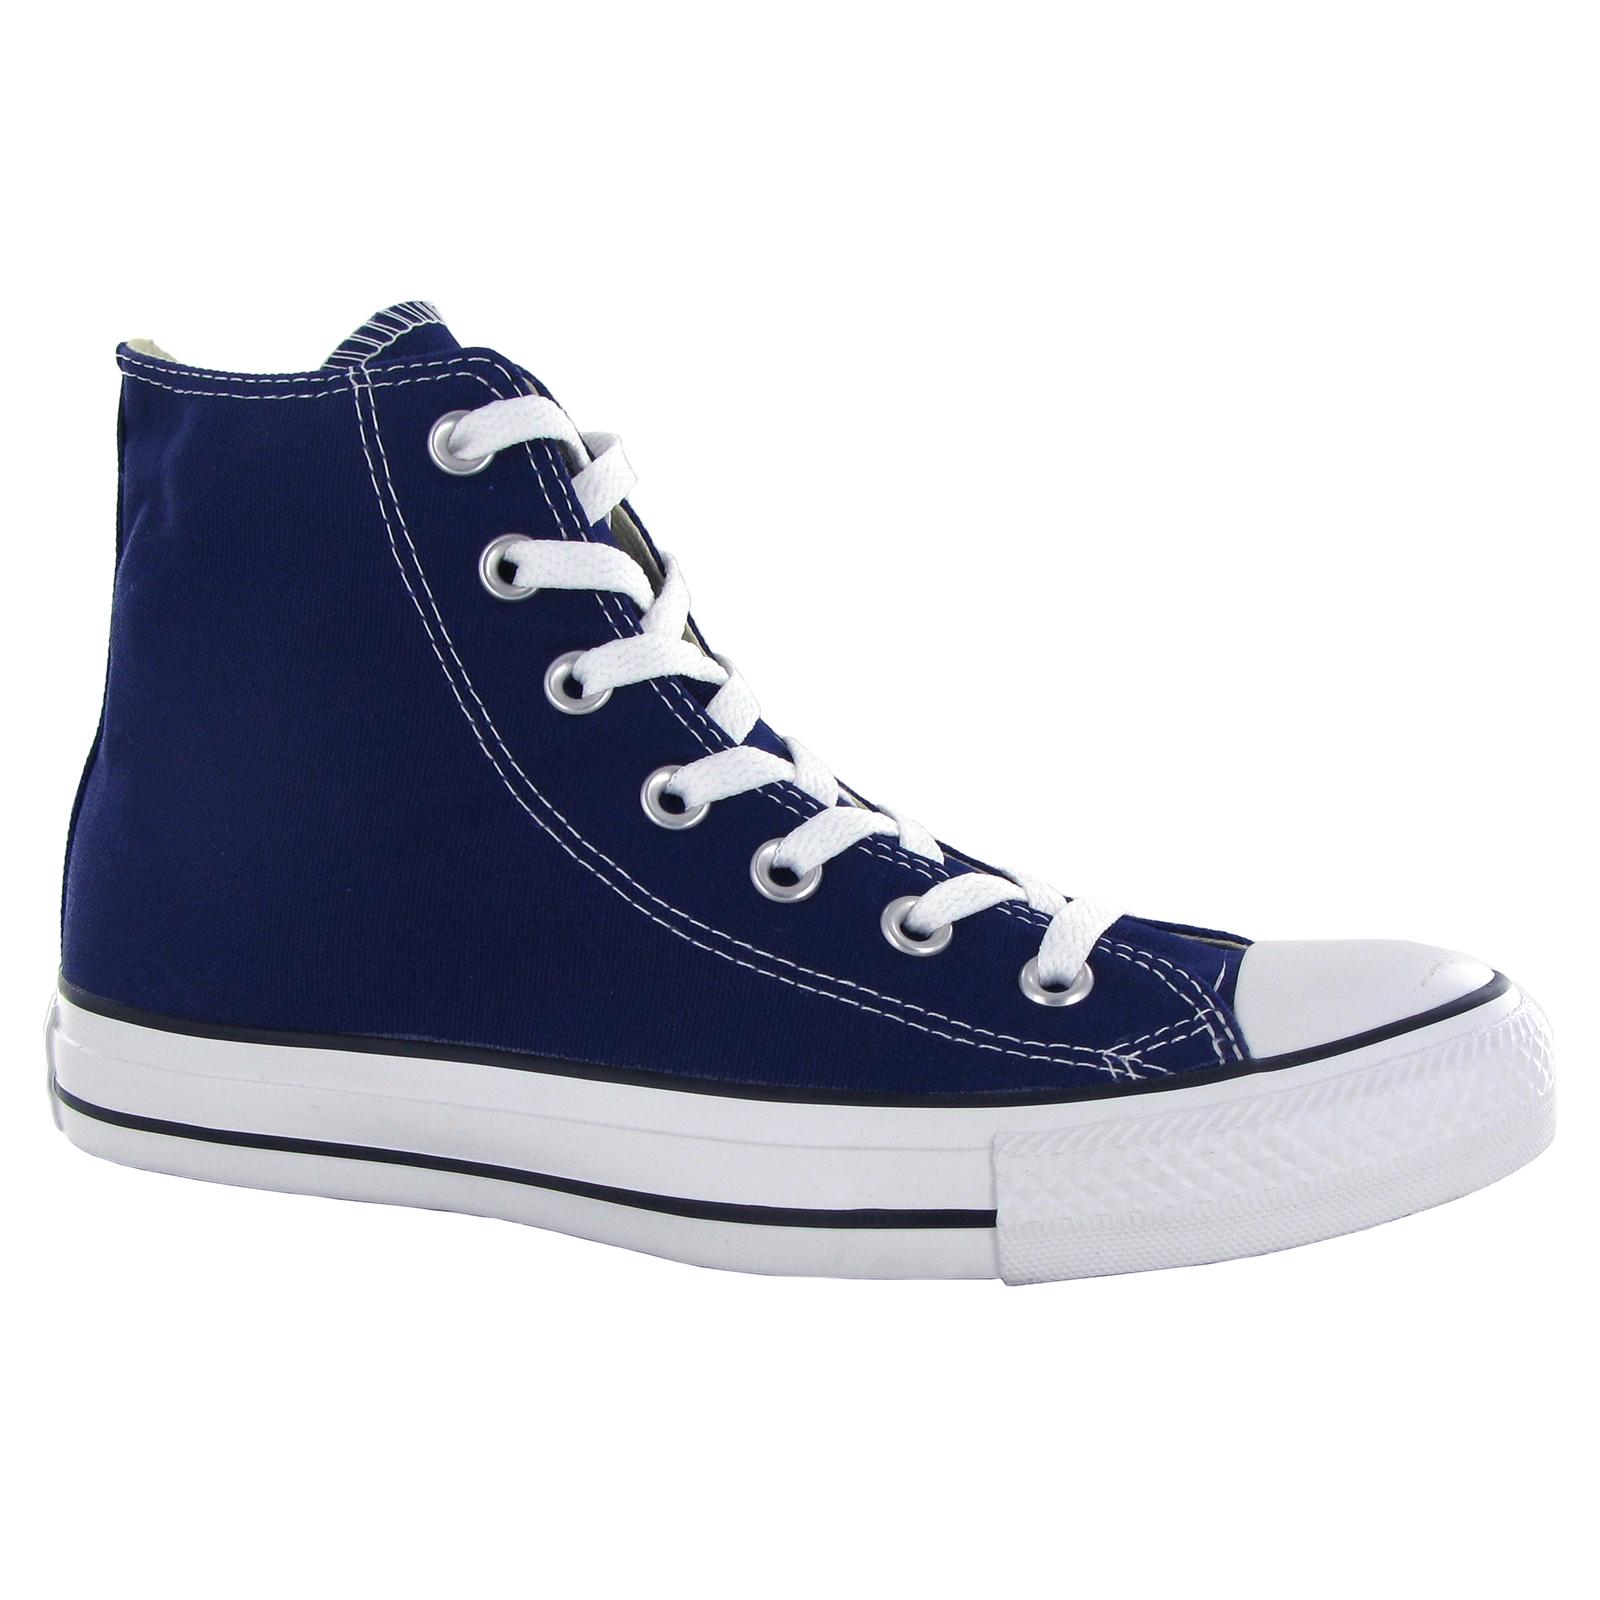 828a6c94ab5e Converse Unisex Chuck Taylor All Star High Top Blue Ribbon 132308F